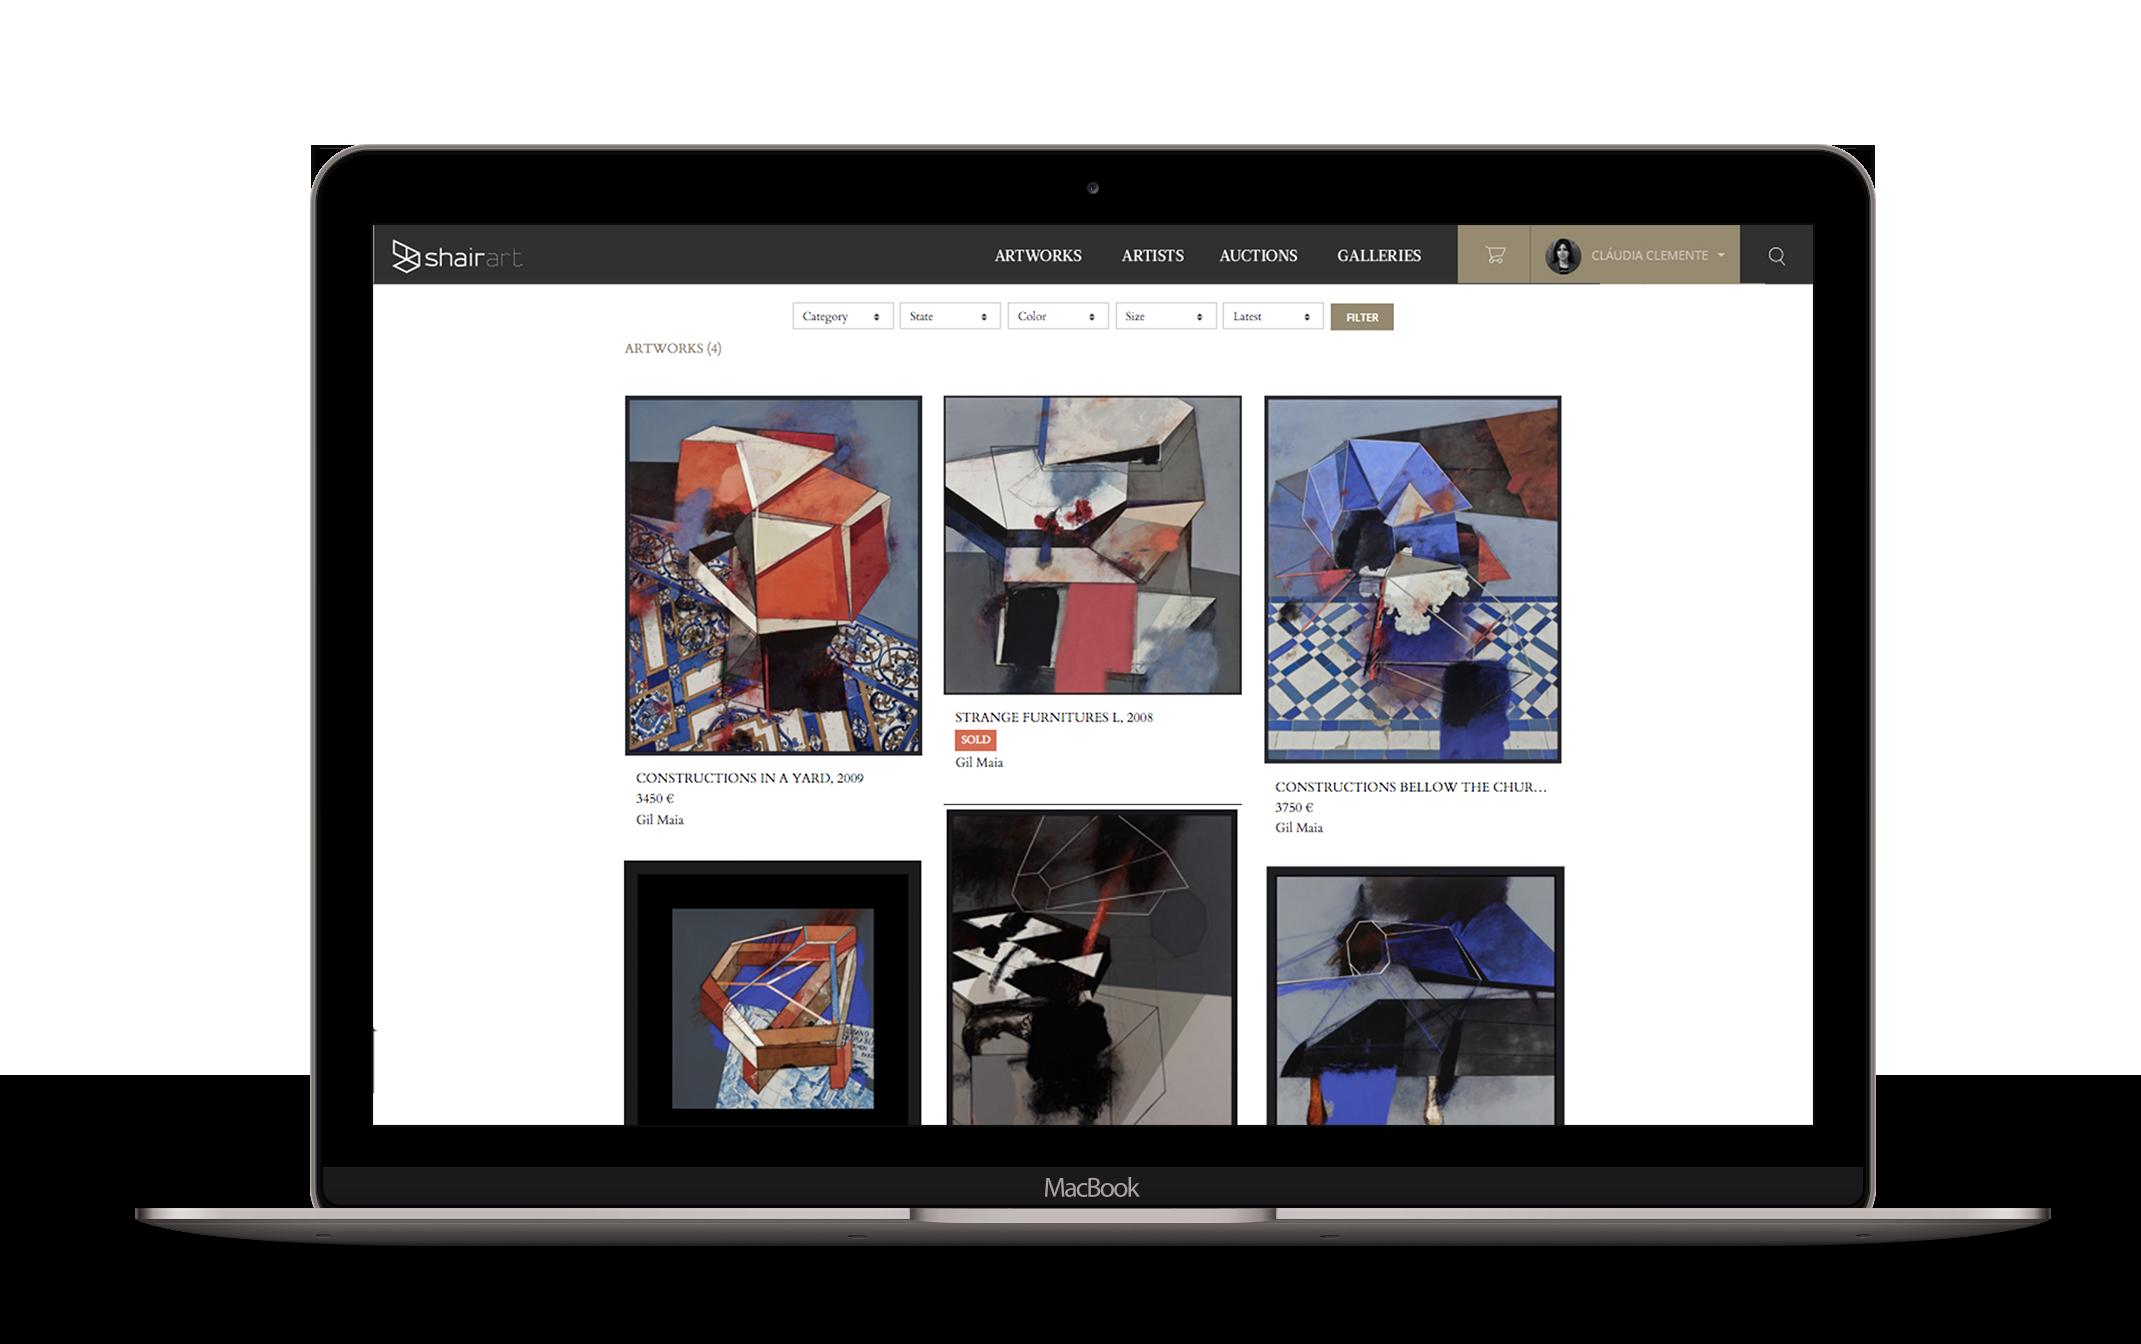 artist profile on macbook 2